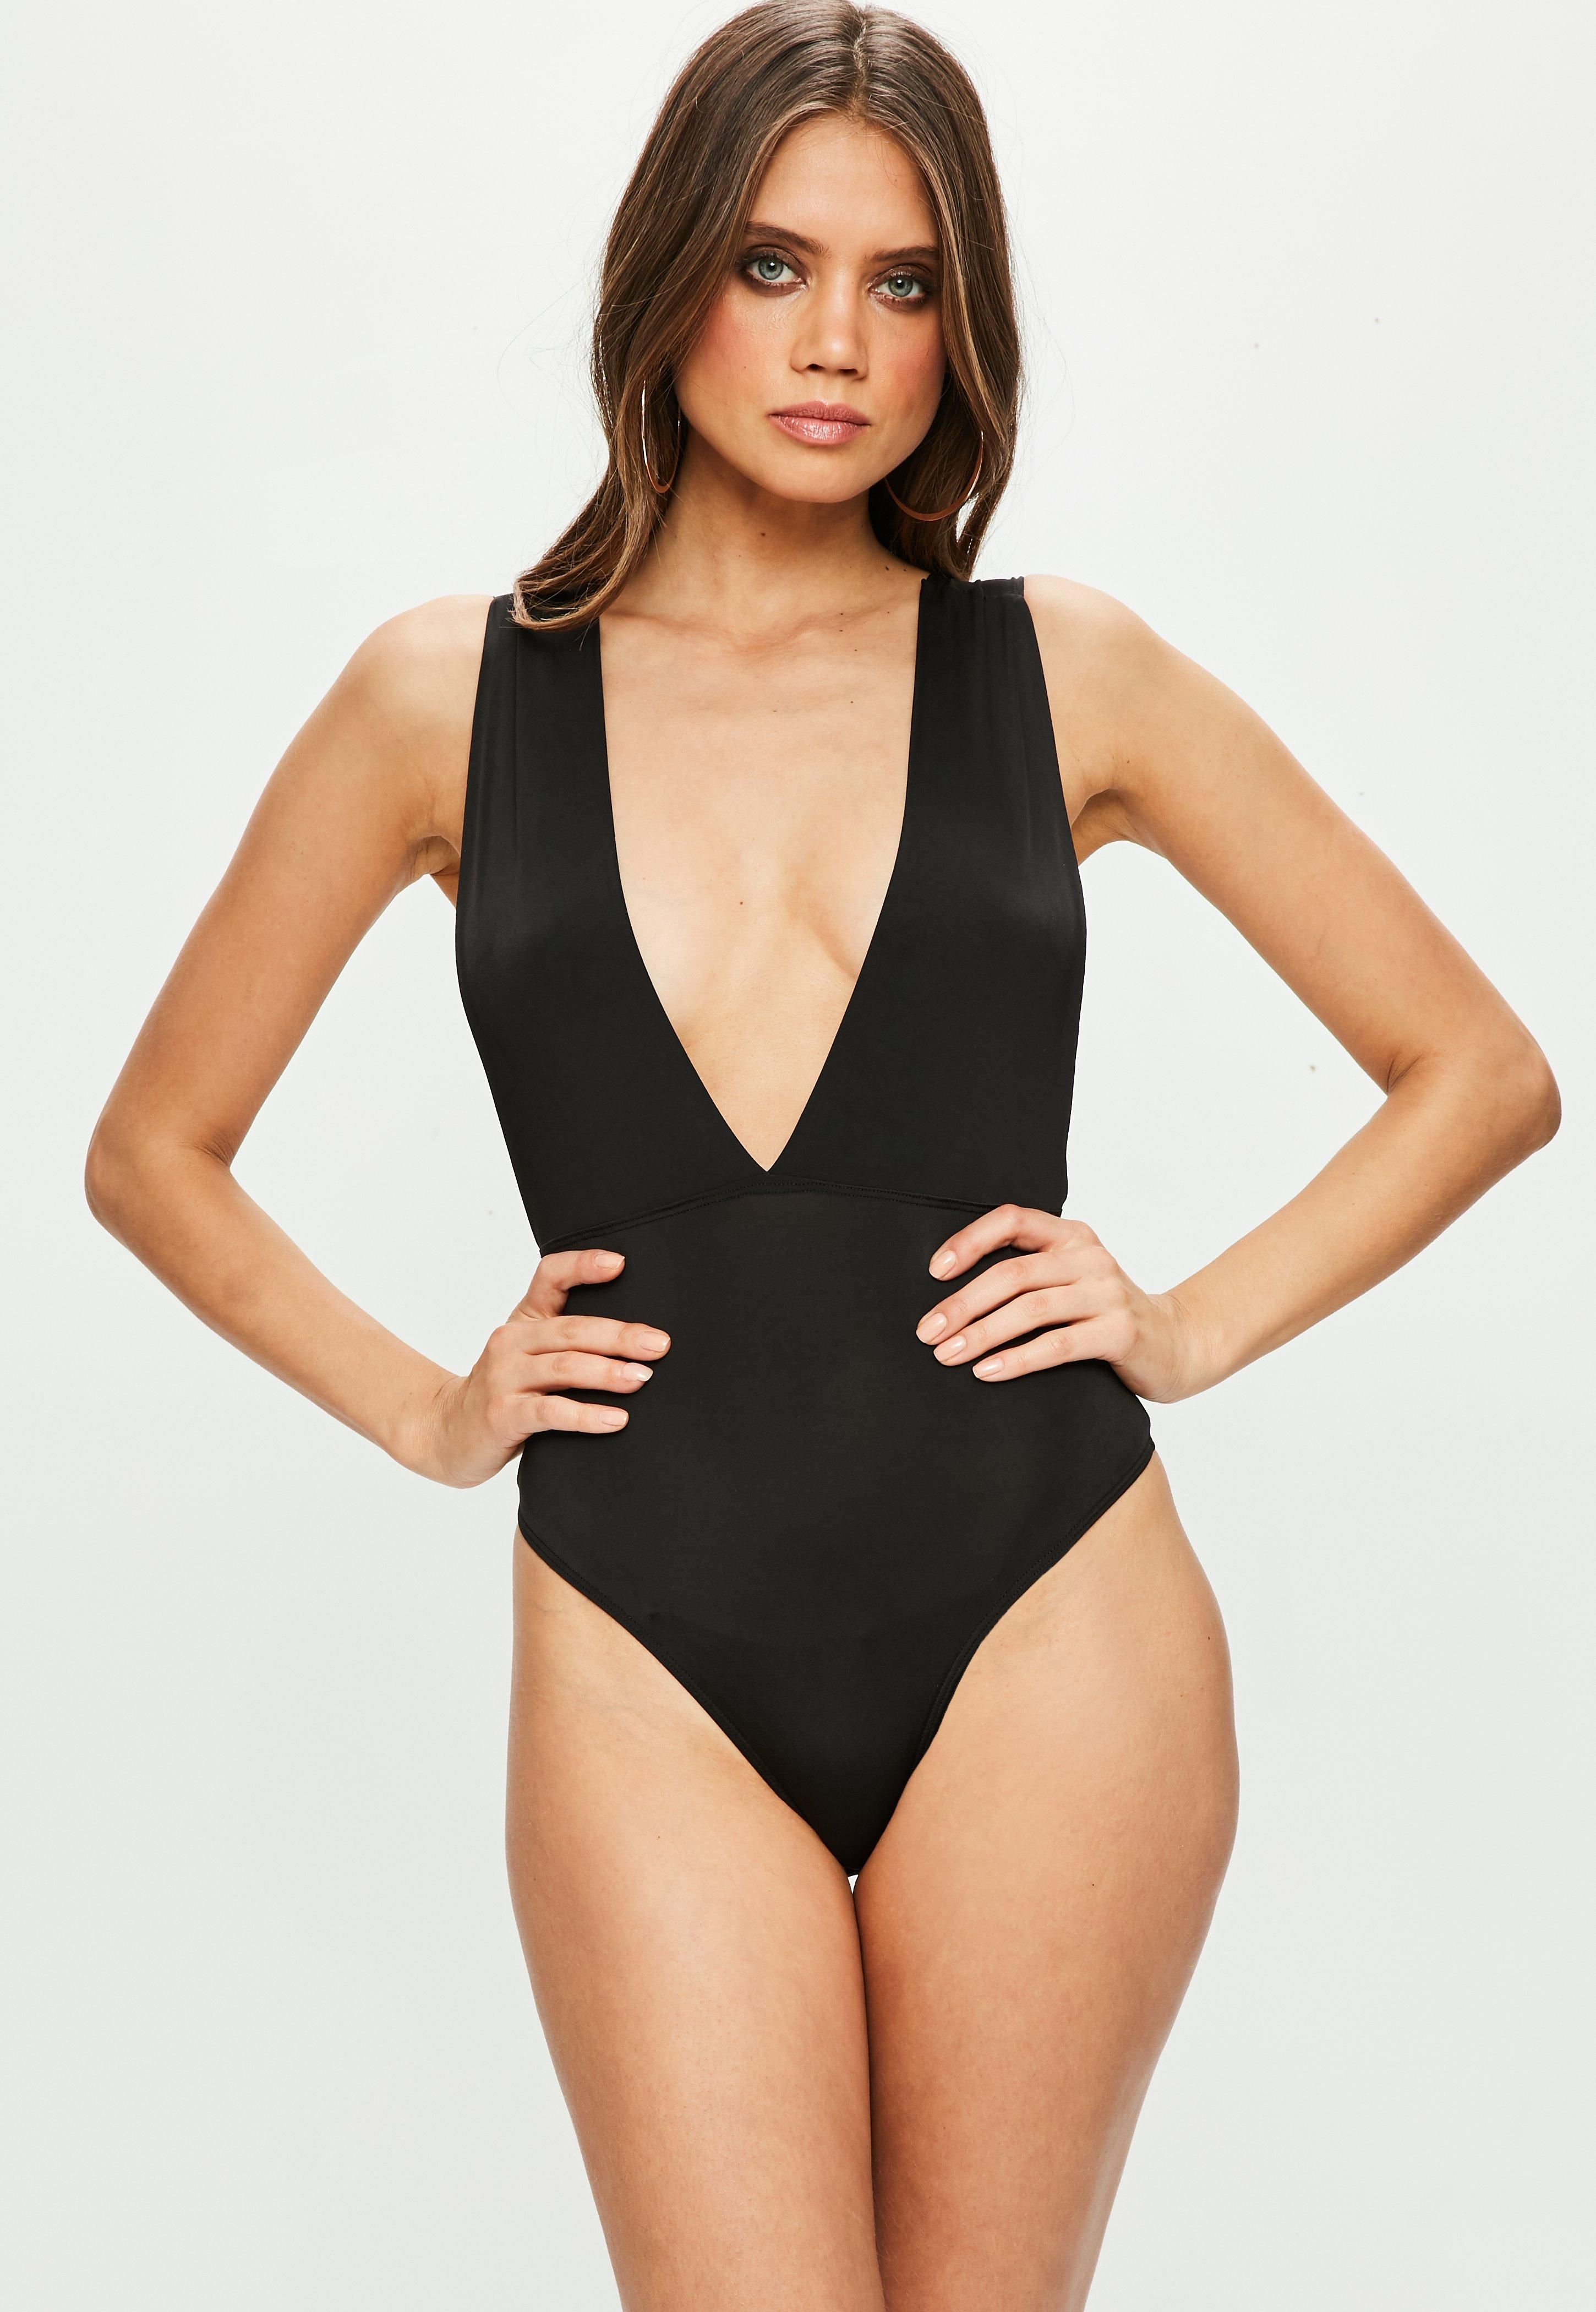 69e18b3d962 Black bodysuit featuring an extreme plunge neckline